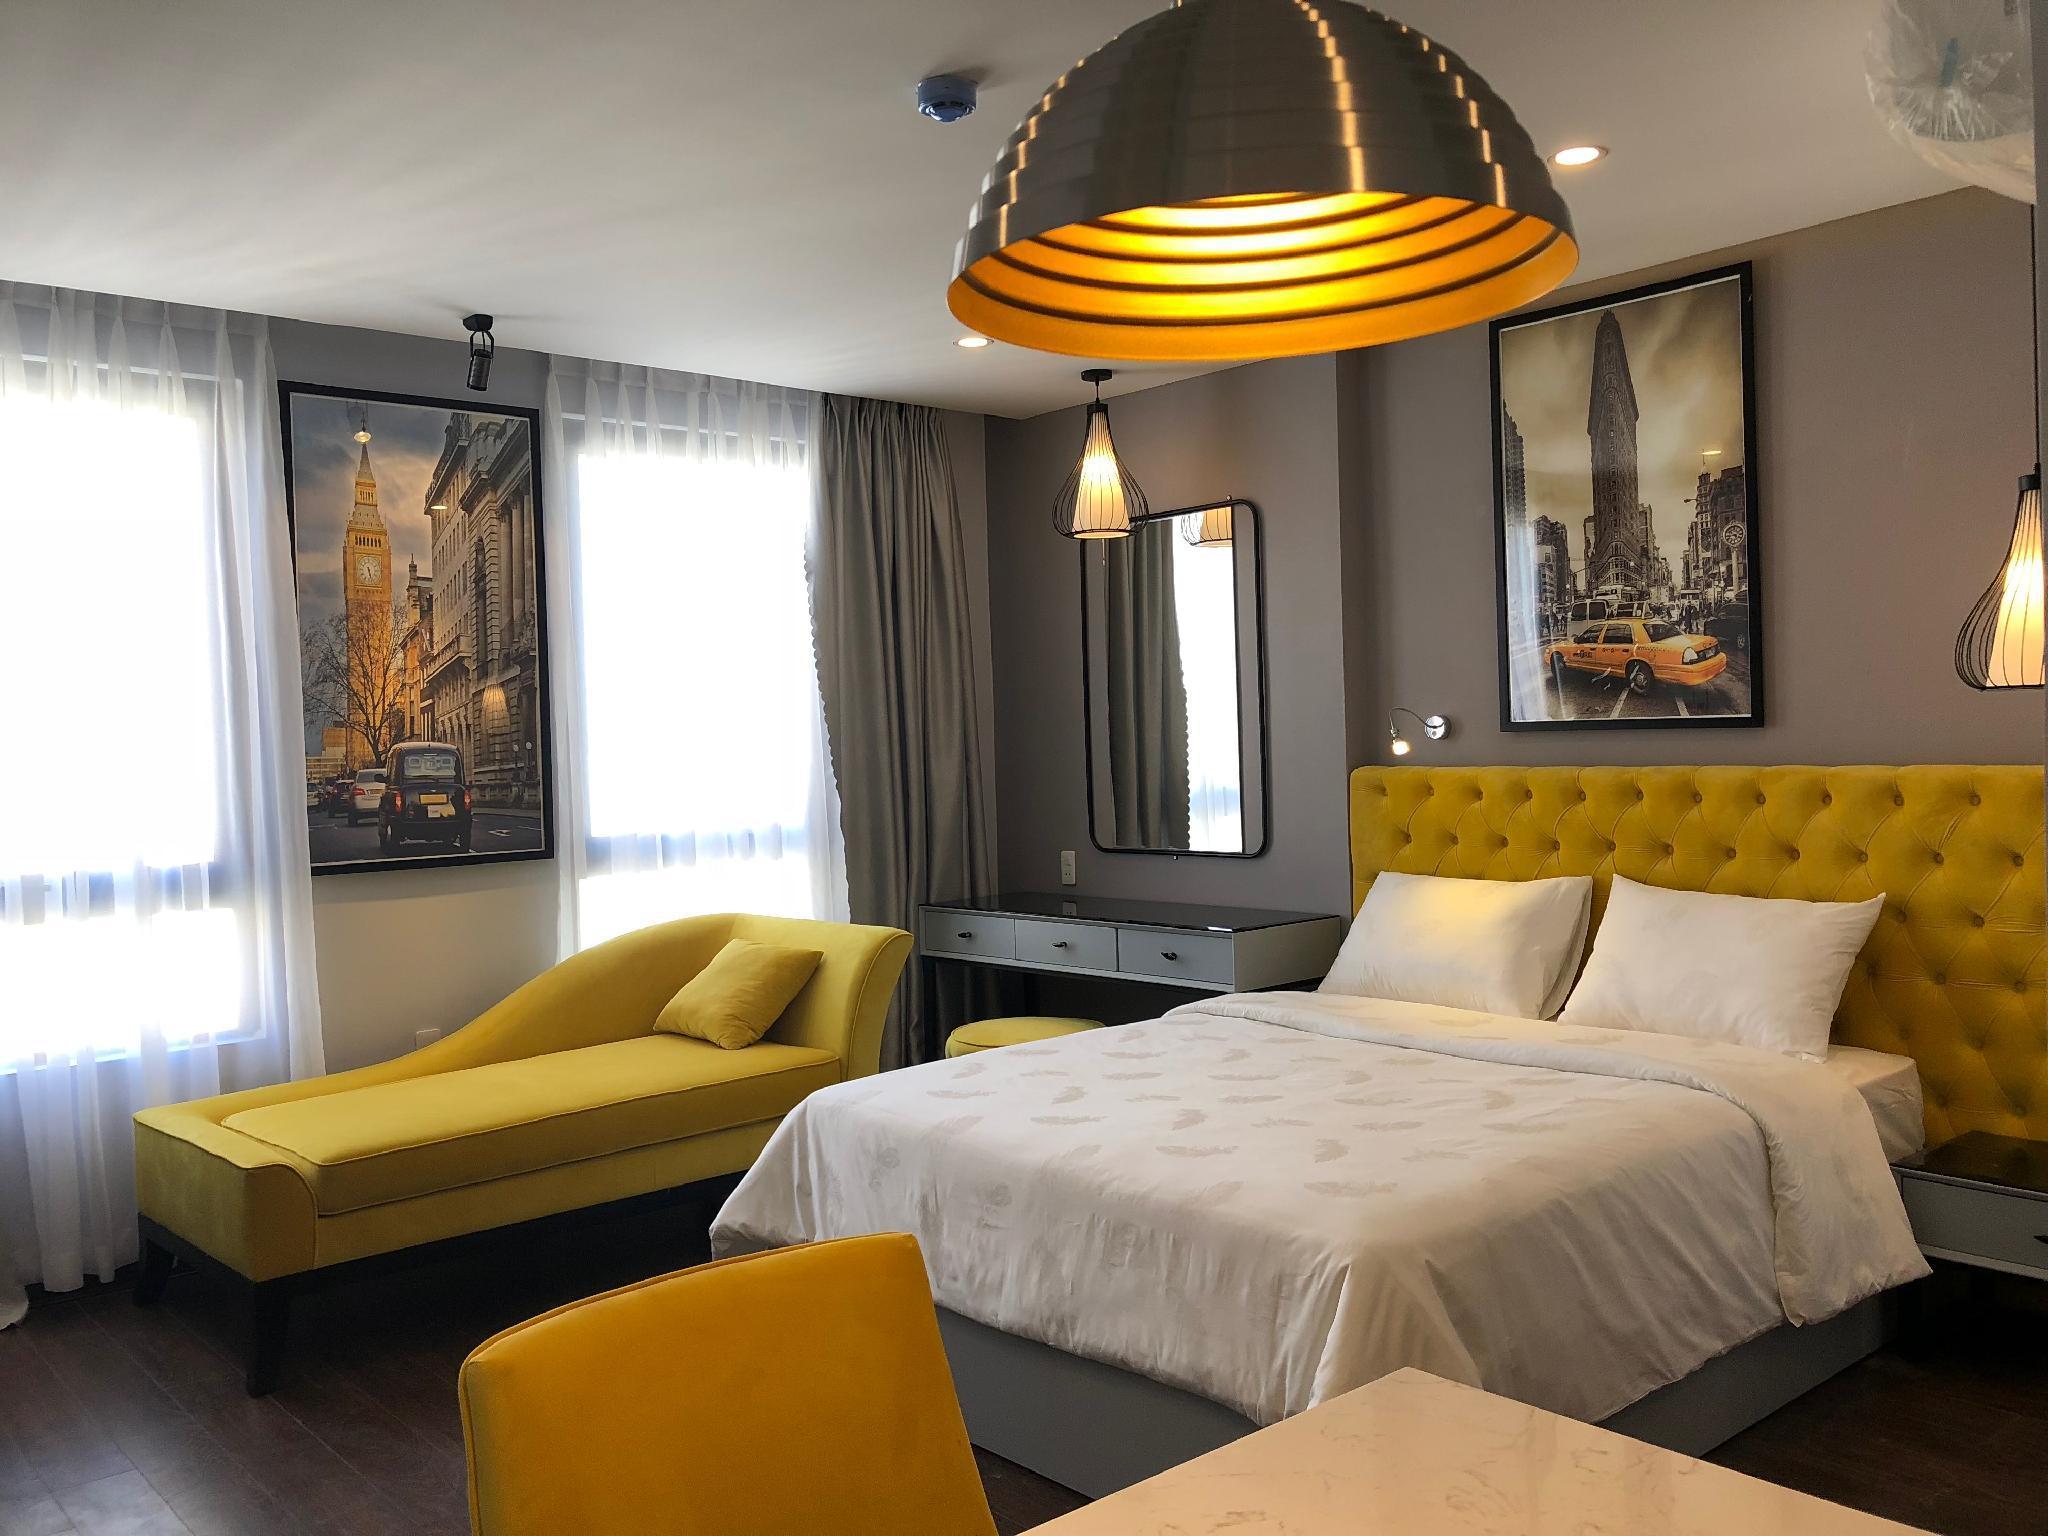 Sunny Beach Hotel And Apartment